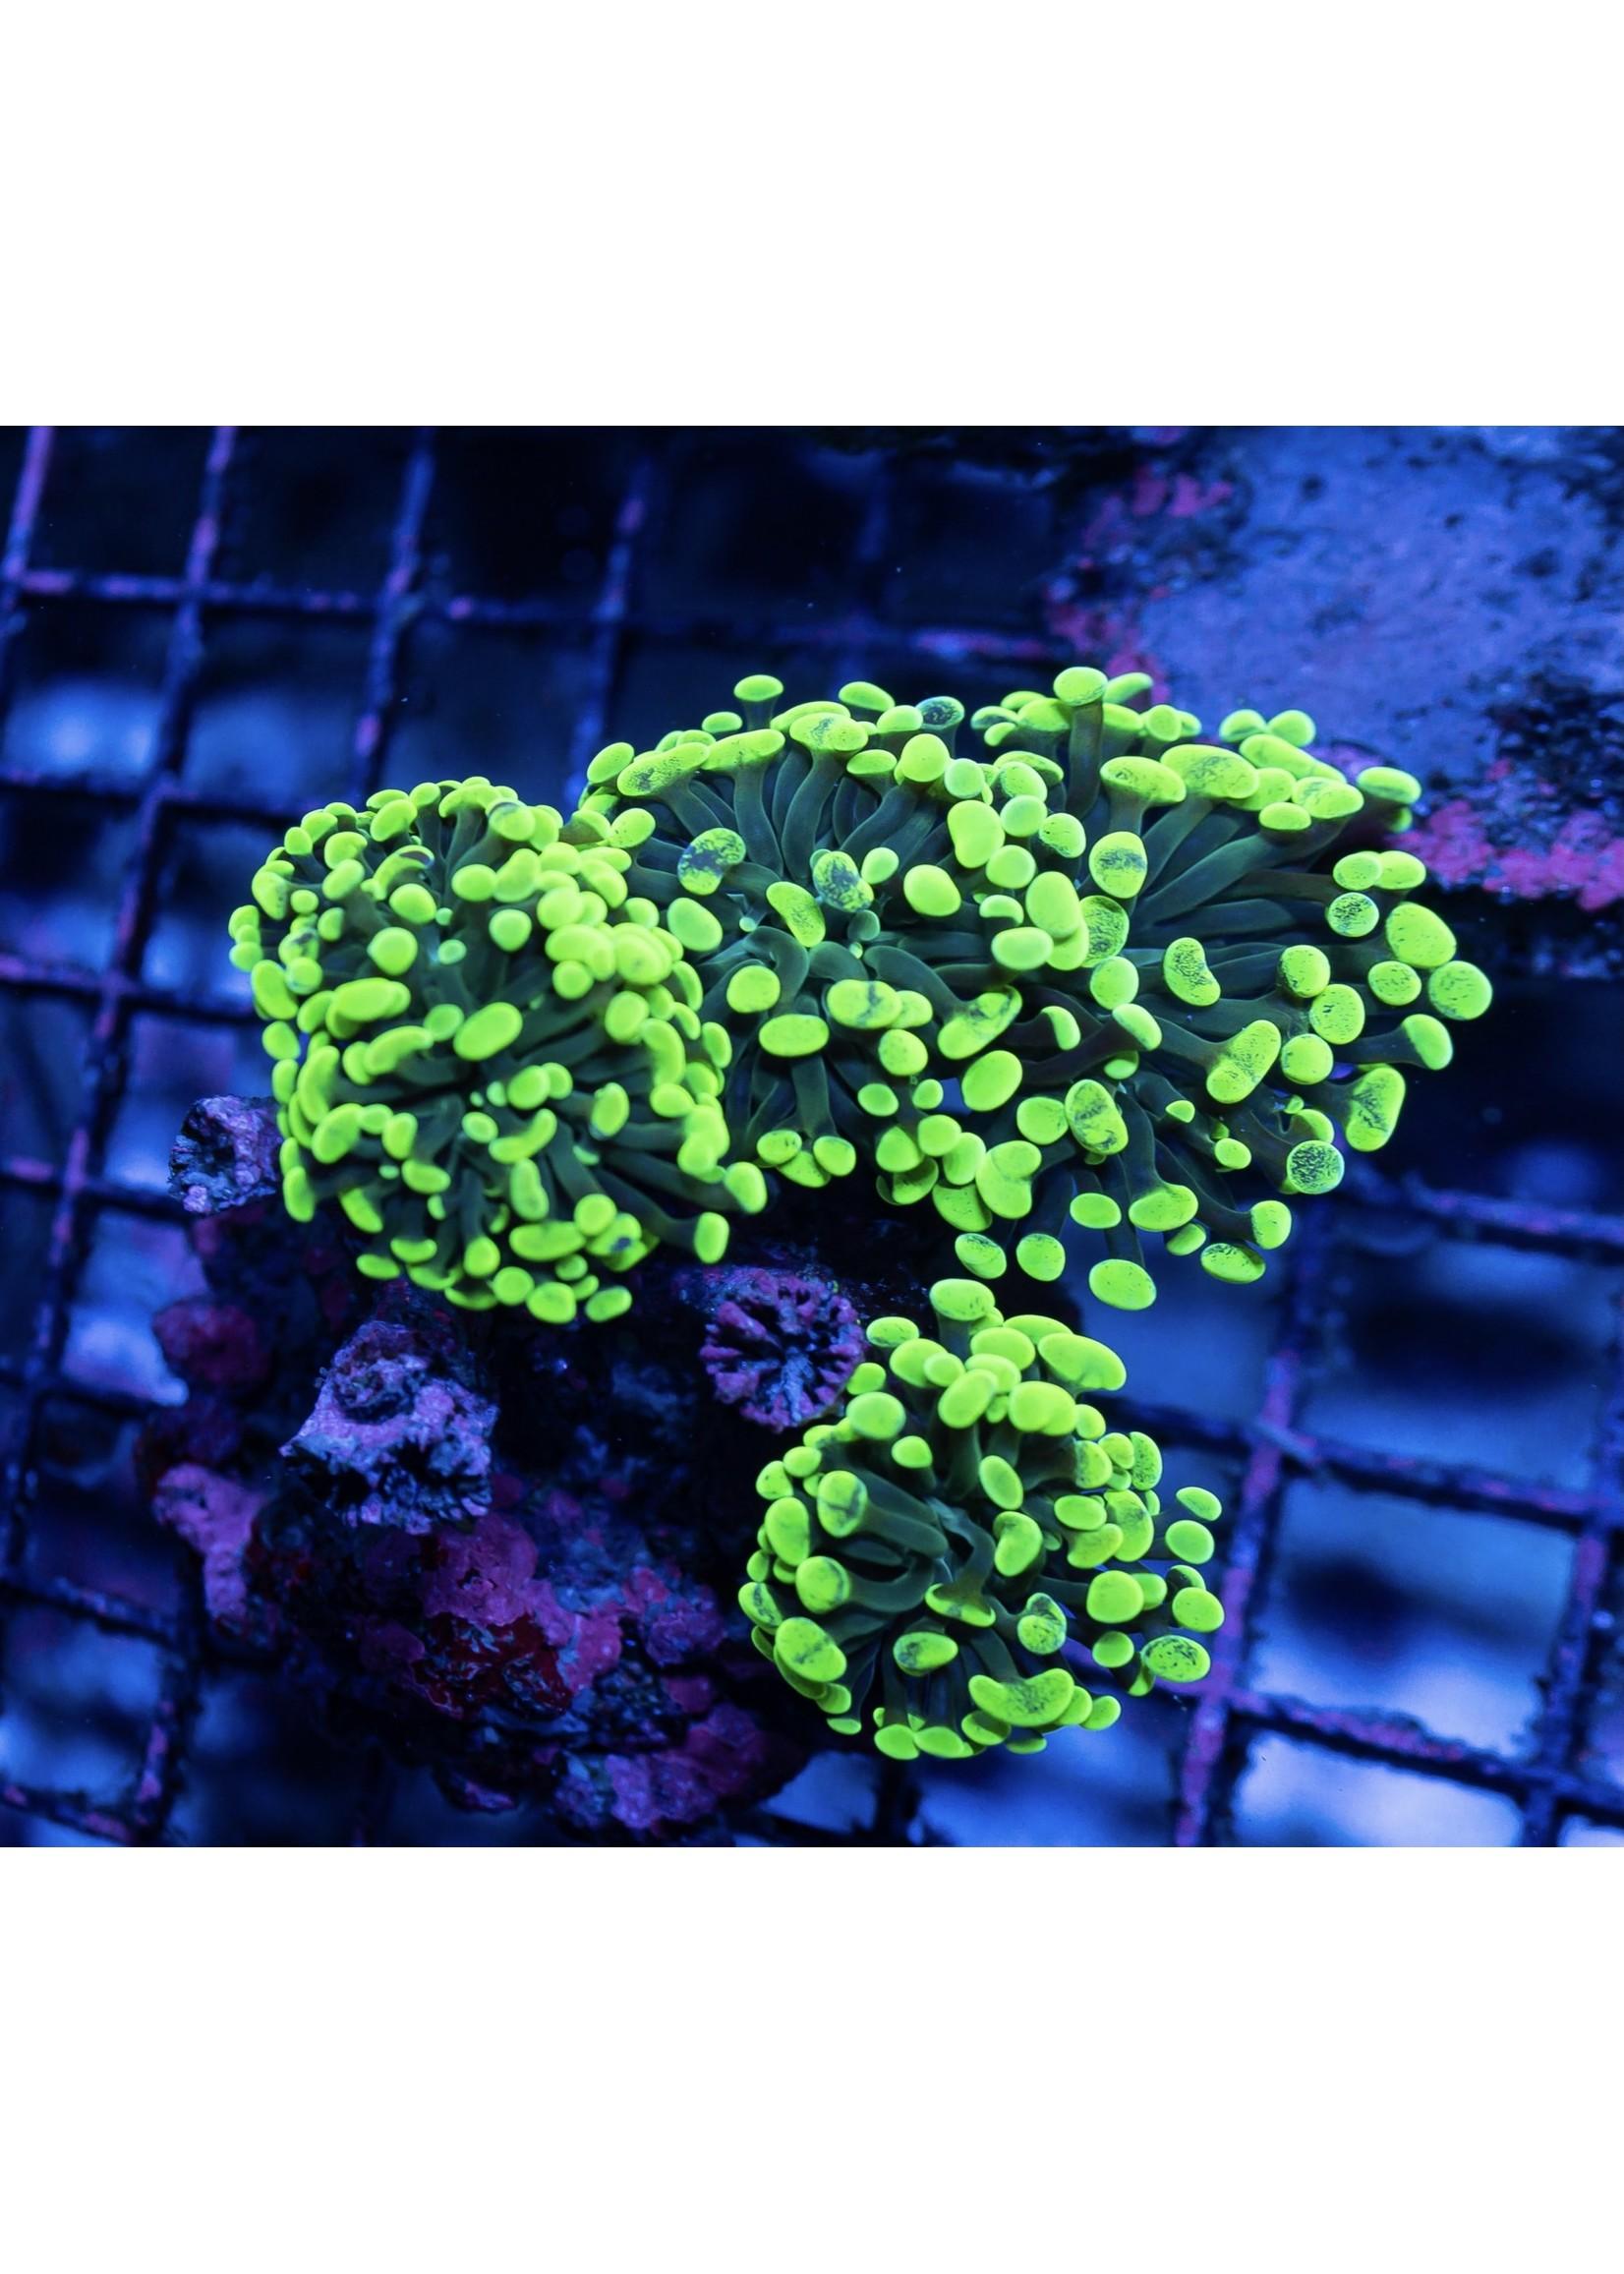 Hammer Indo Neon Splatter Branching Hammer  WYSIWYG